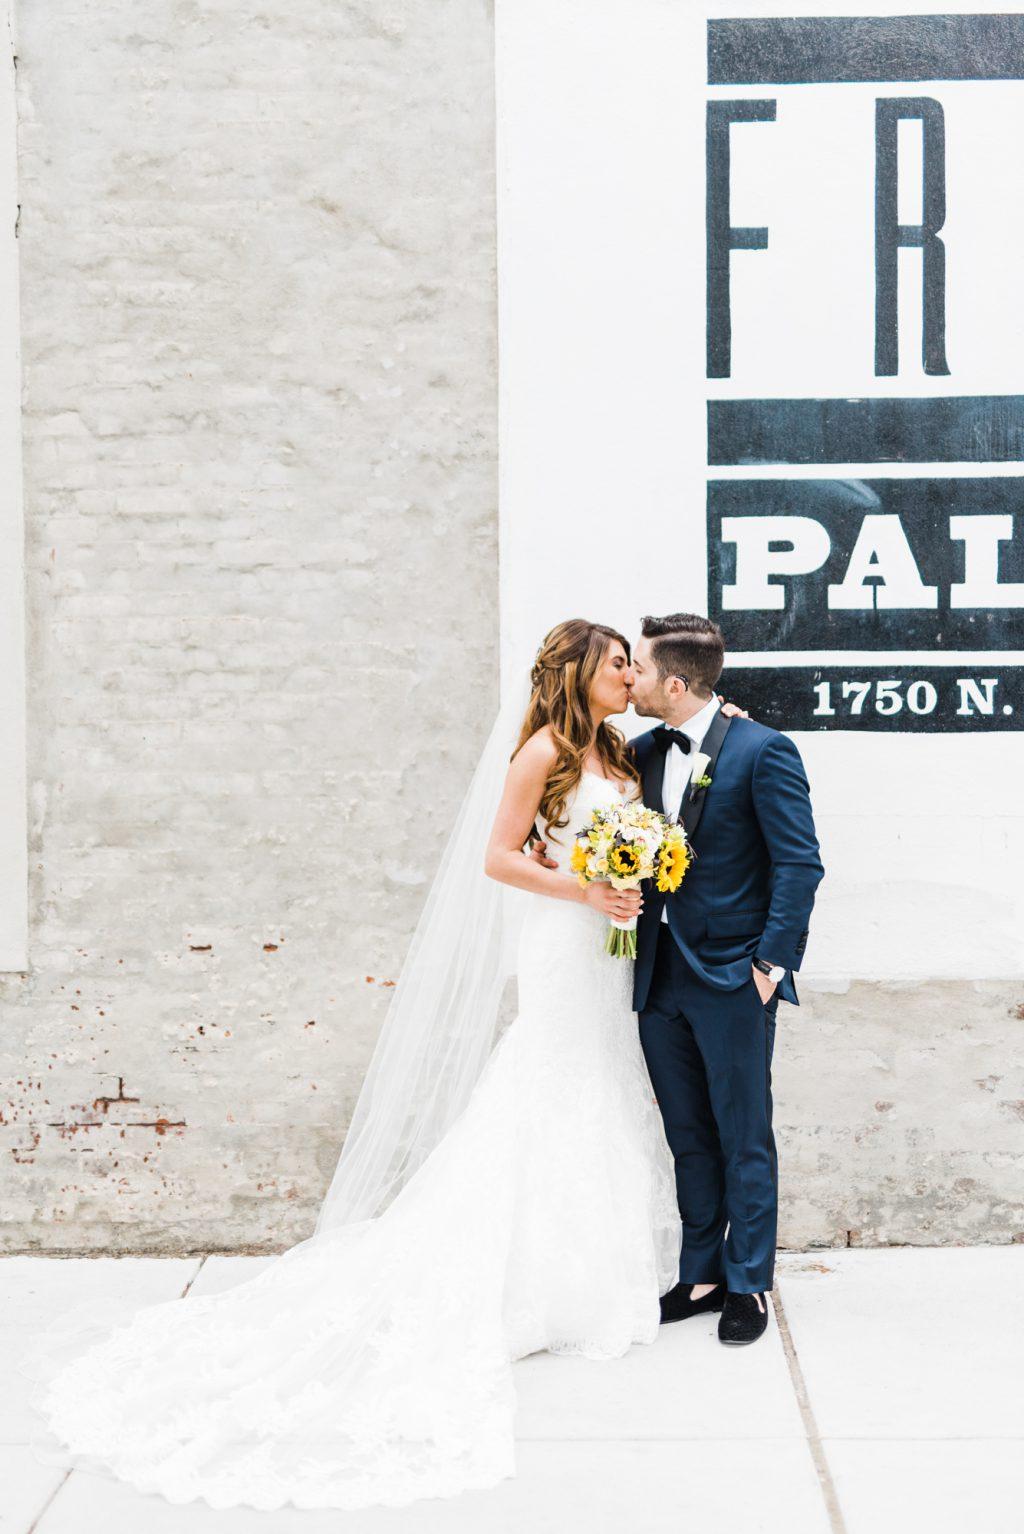 haleyrichterphoto-front-and-palmer-spring-wedding-rodin-museum-loews-hotel-philadelphia-105